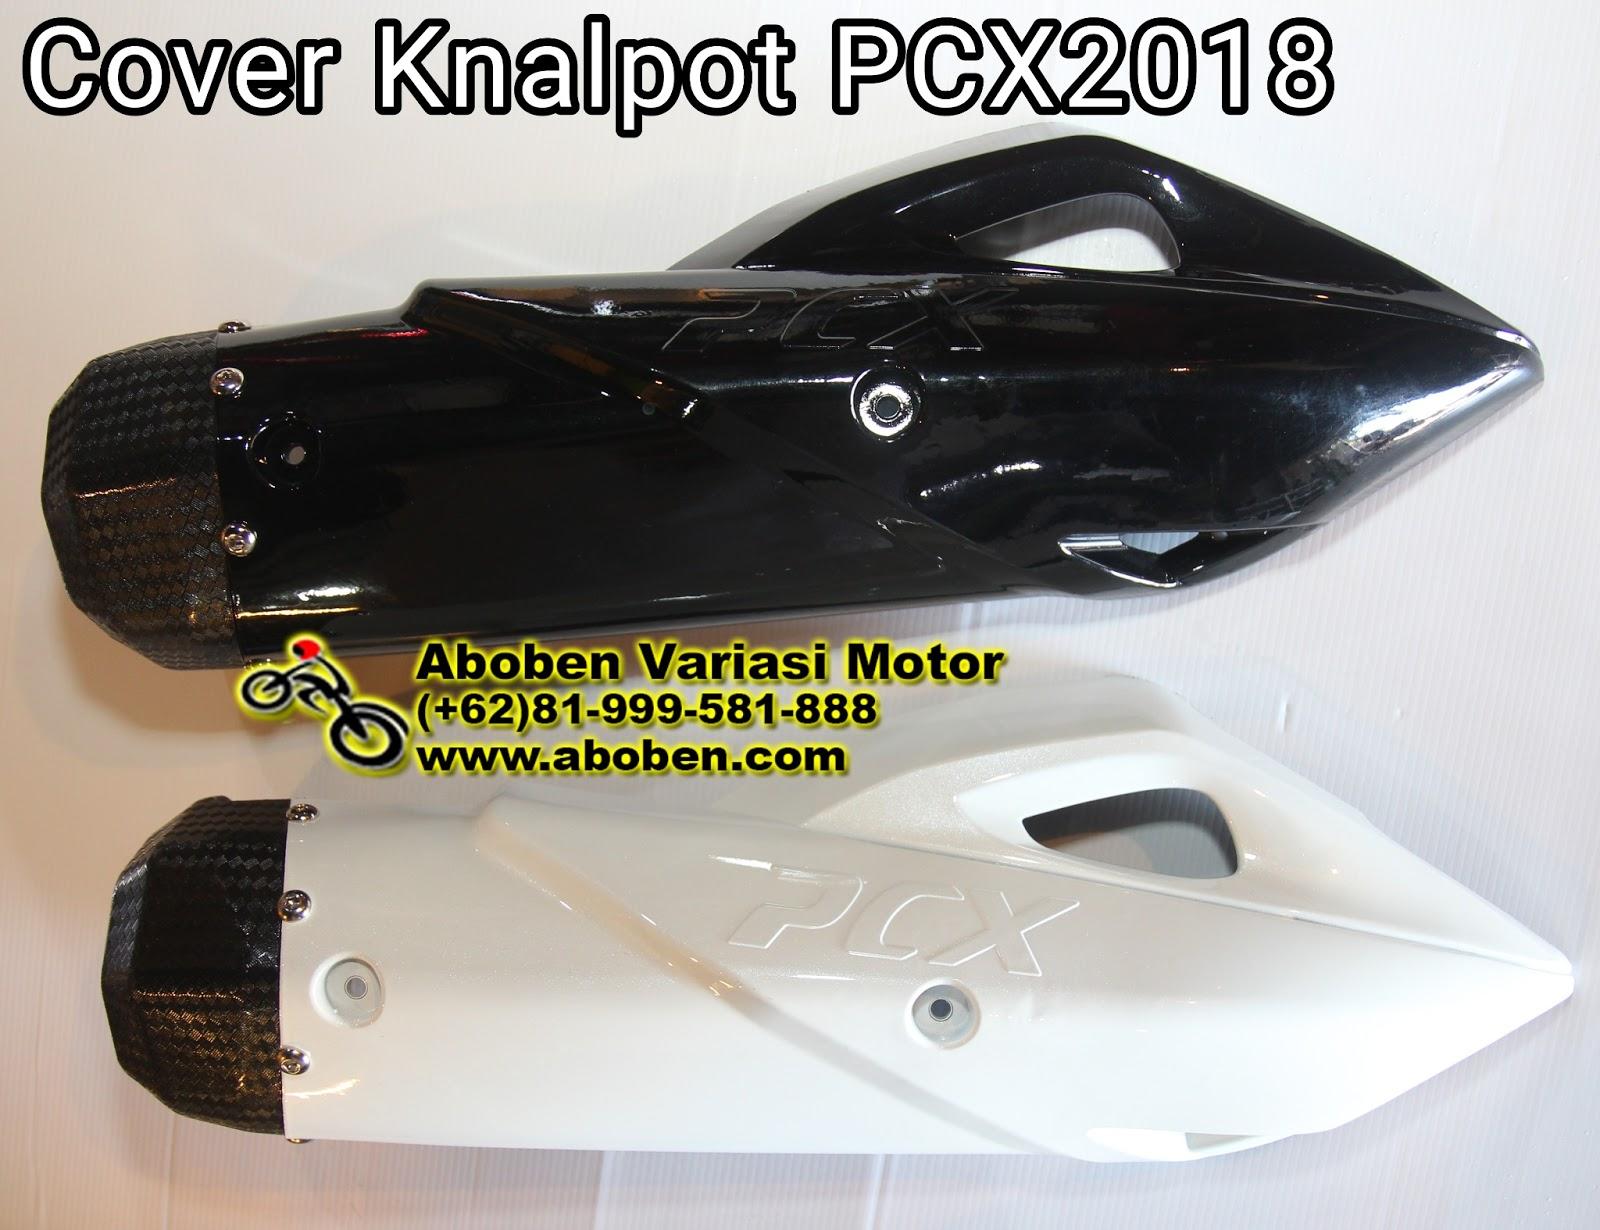 Cover Knalpot Vario 150 Pelindung Tutup Pcx 2018 Lokal